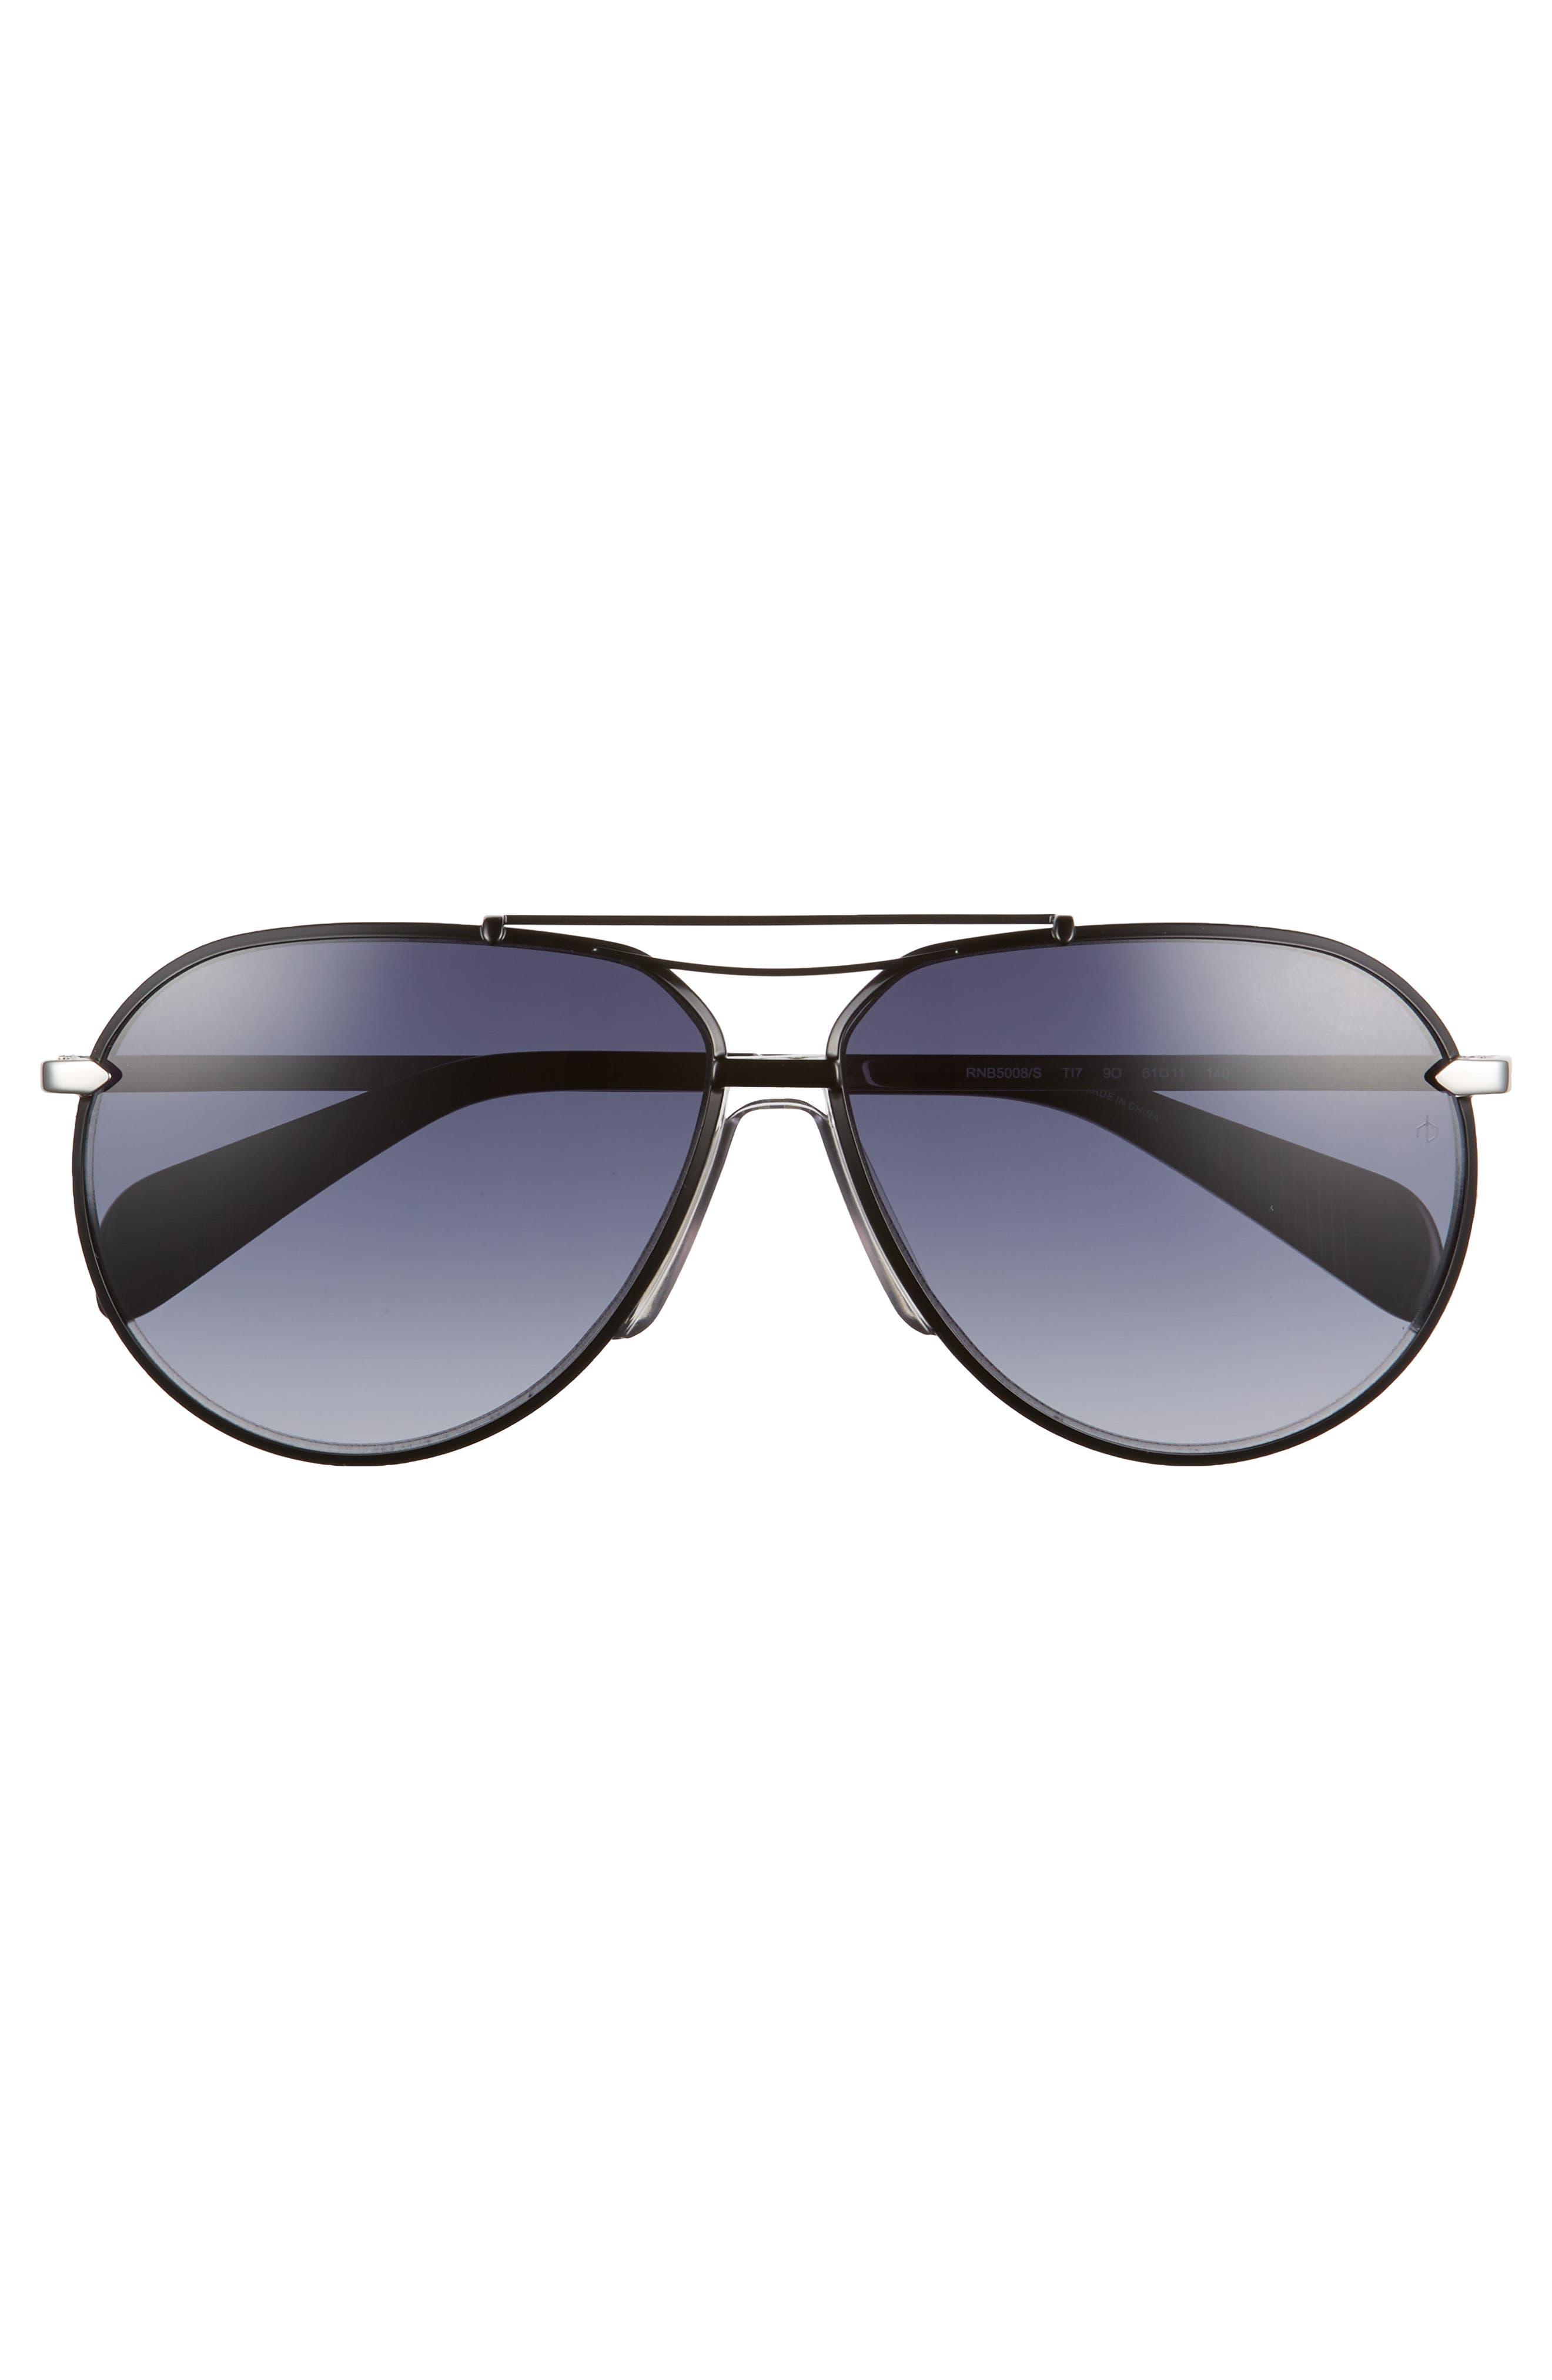 61mm Aviator Gradient Sunglasses,                             Alternate thumbnail 2, color,                             RUTHENIUM/ MATTE BLACK